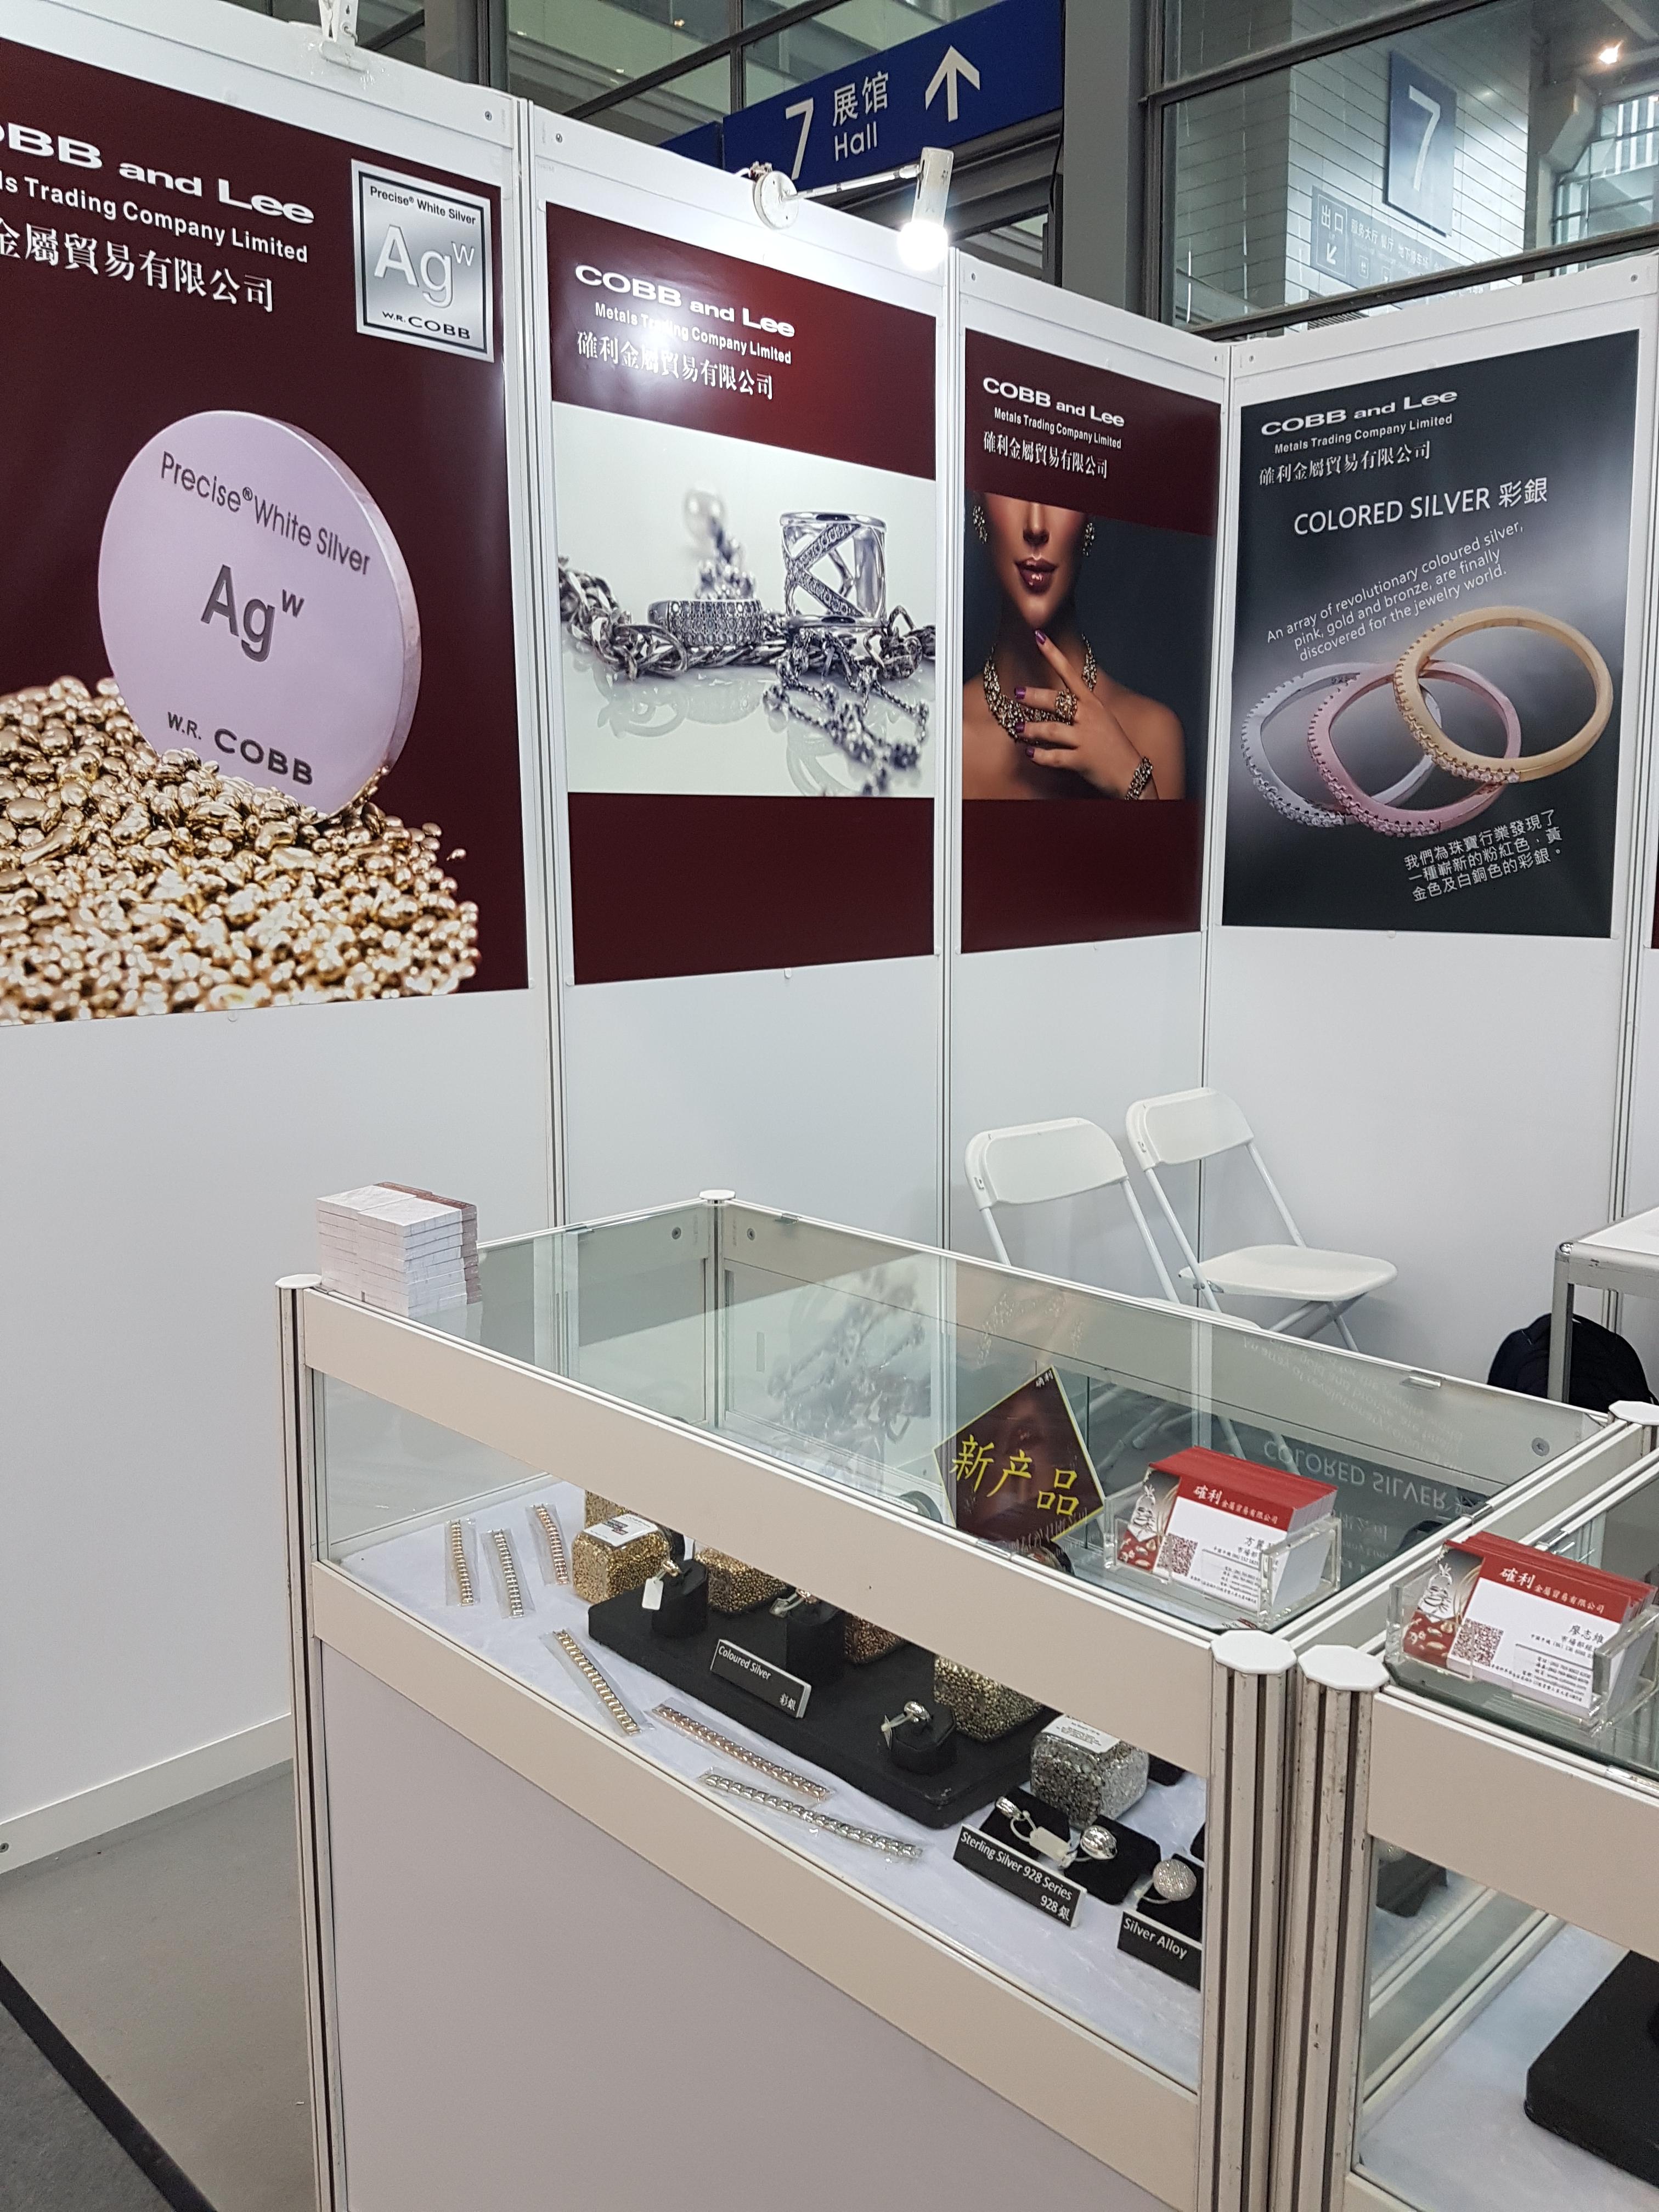 19-22/04/2019<br />China International Gold, Jewellery & Gem Fair – Shenzhen